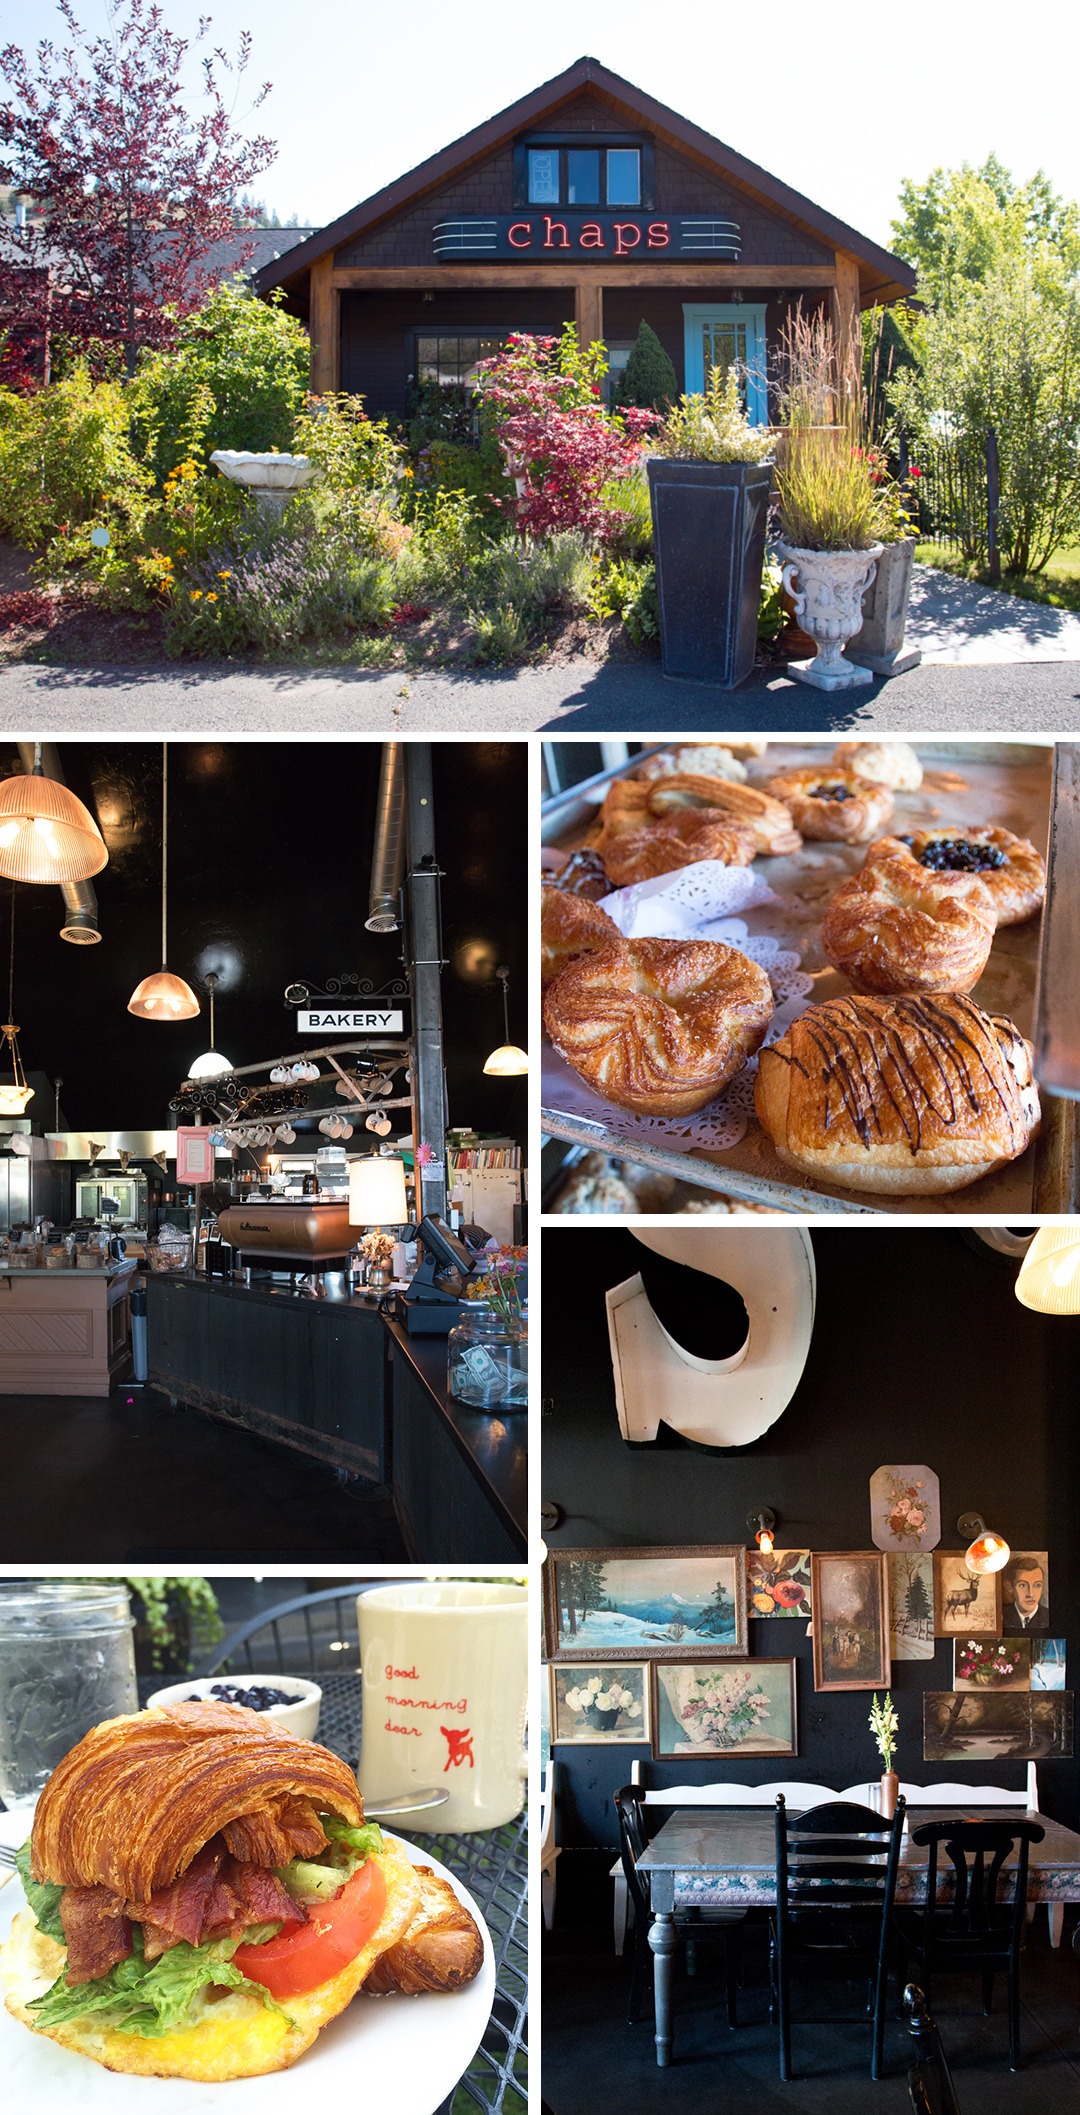 Chaps Coffee in Spokane, WA